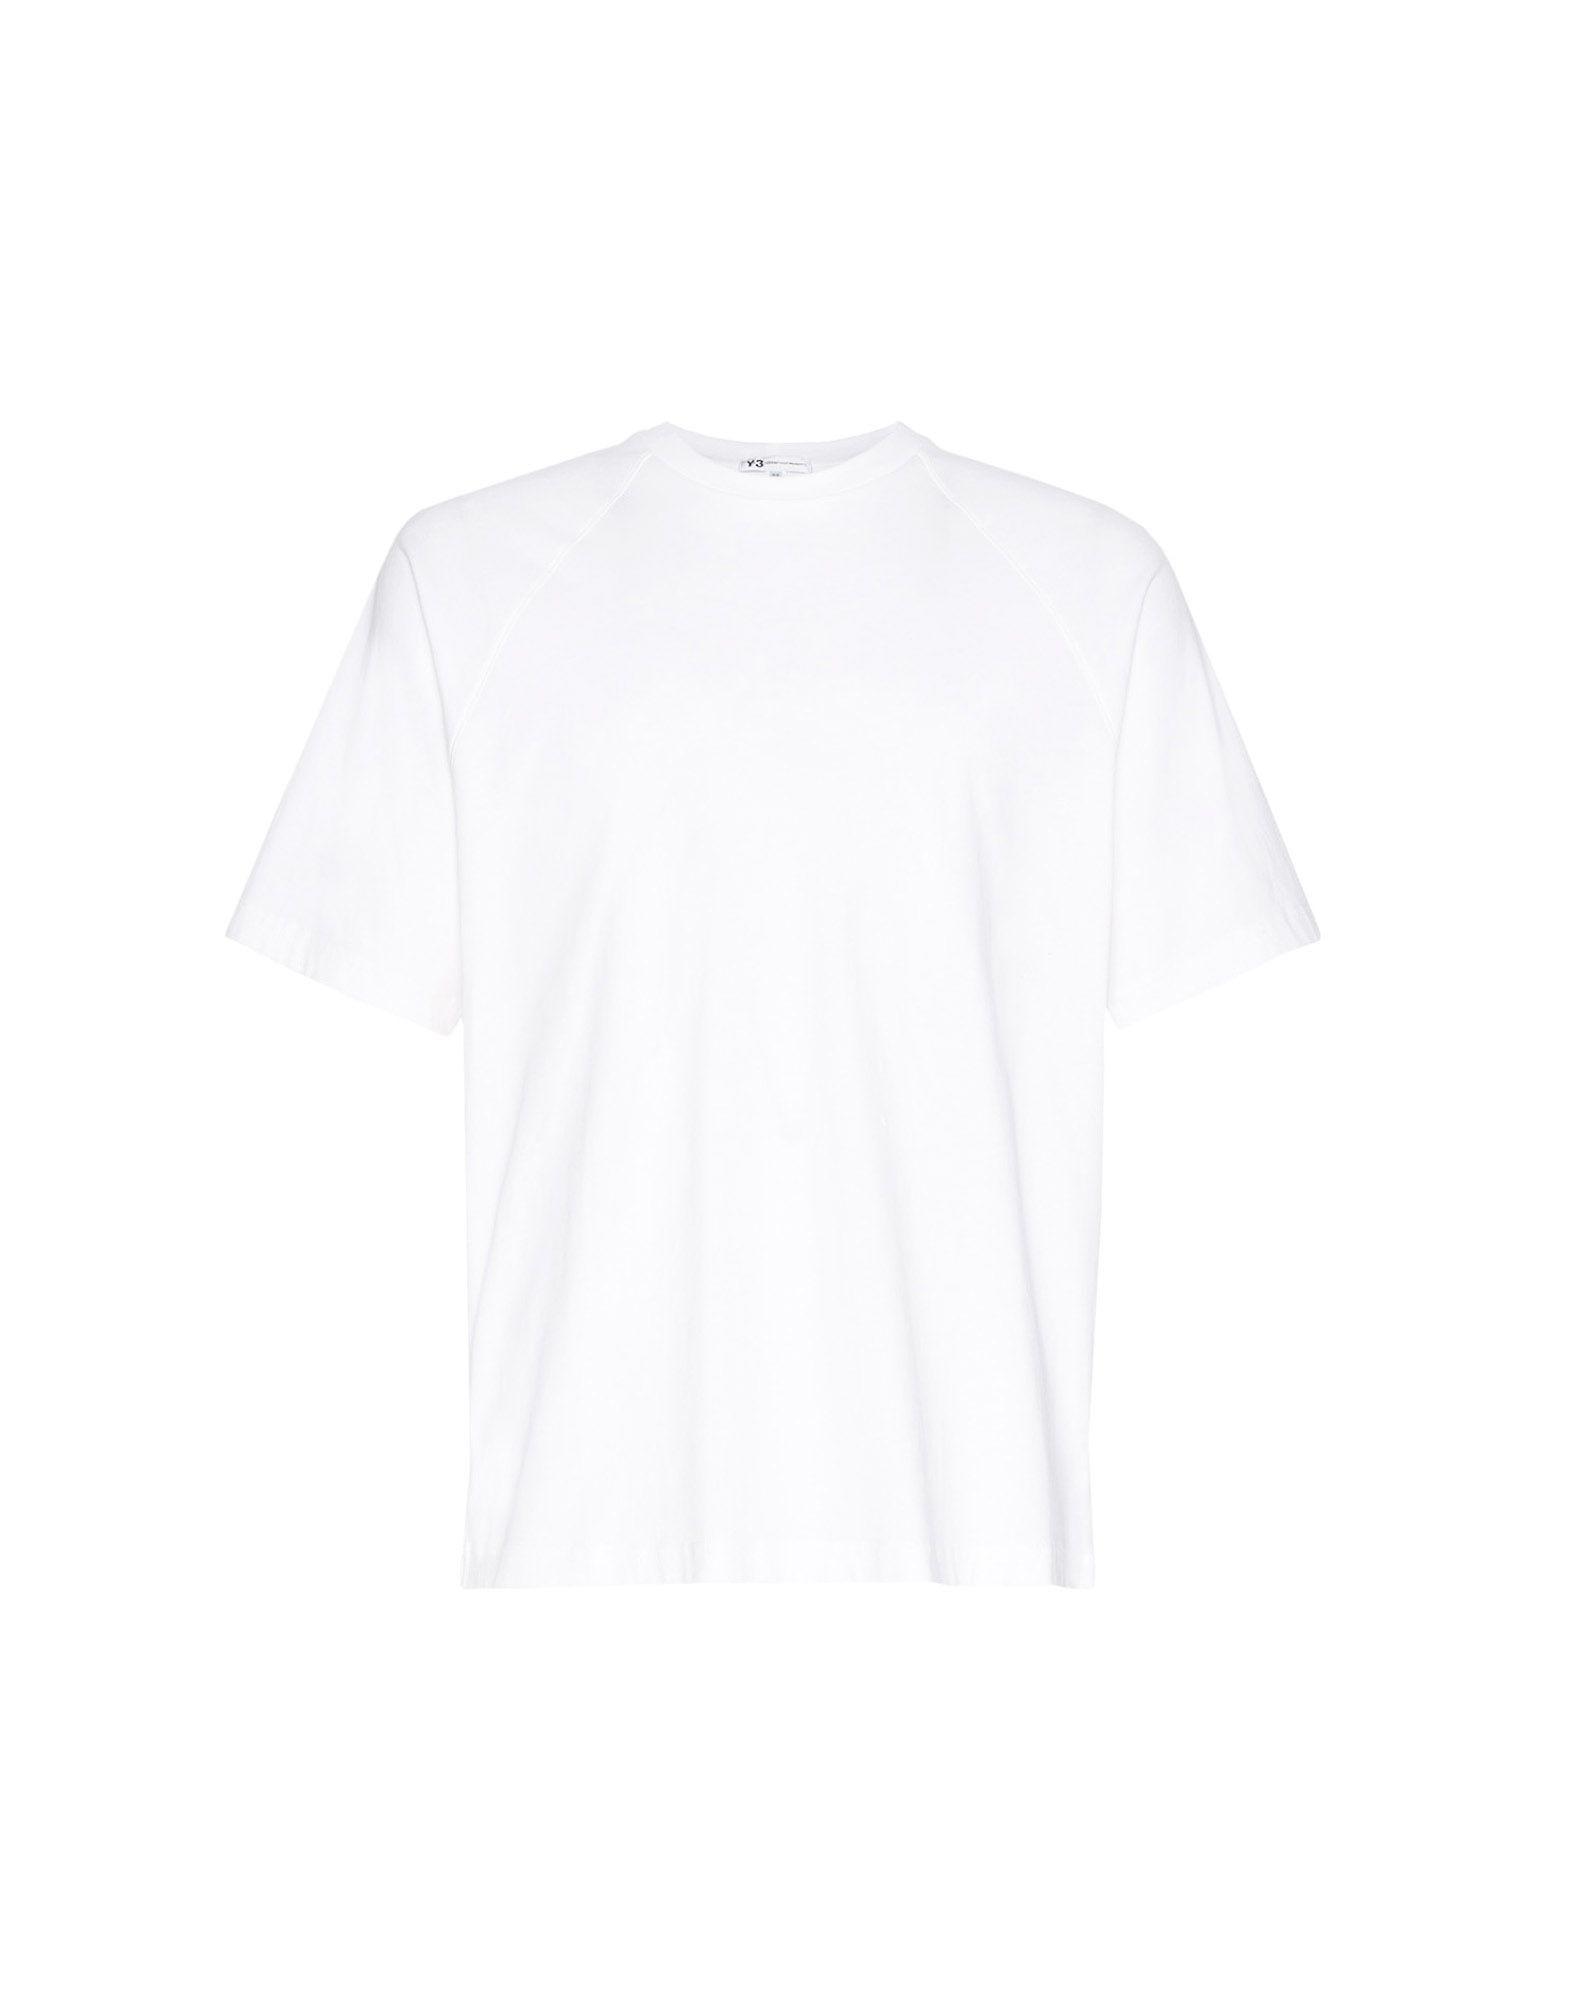 Y-3 Y-3 CLASSIC TEE Short sleeve t-shirt Man f